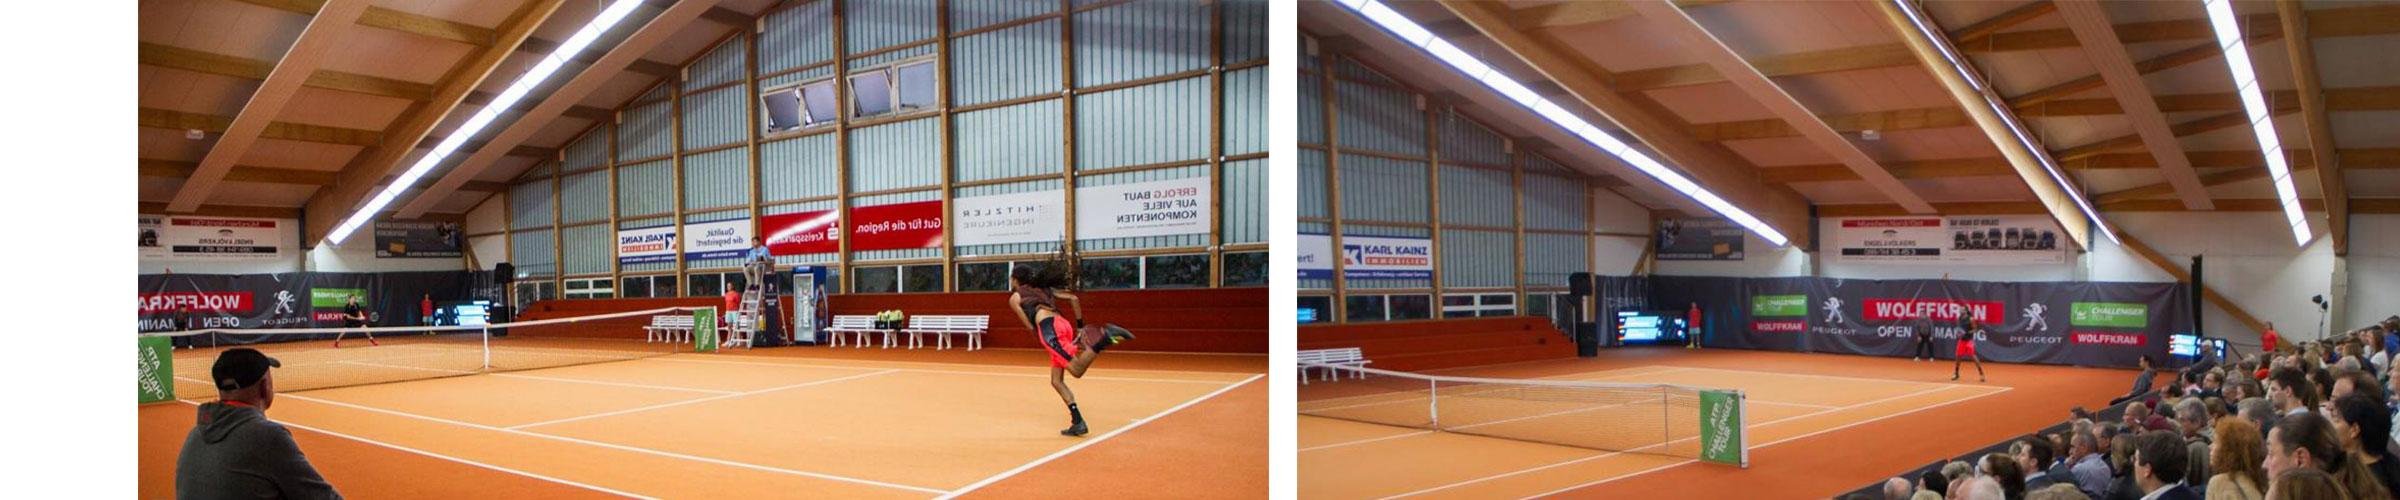 Tennishalle mit SML LED Produkten